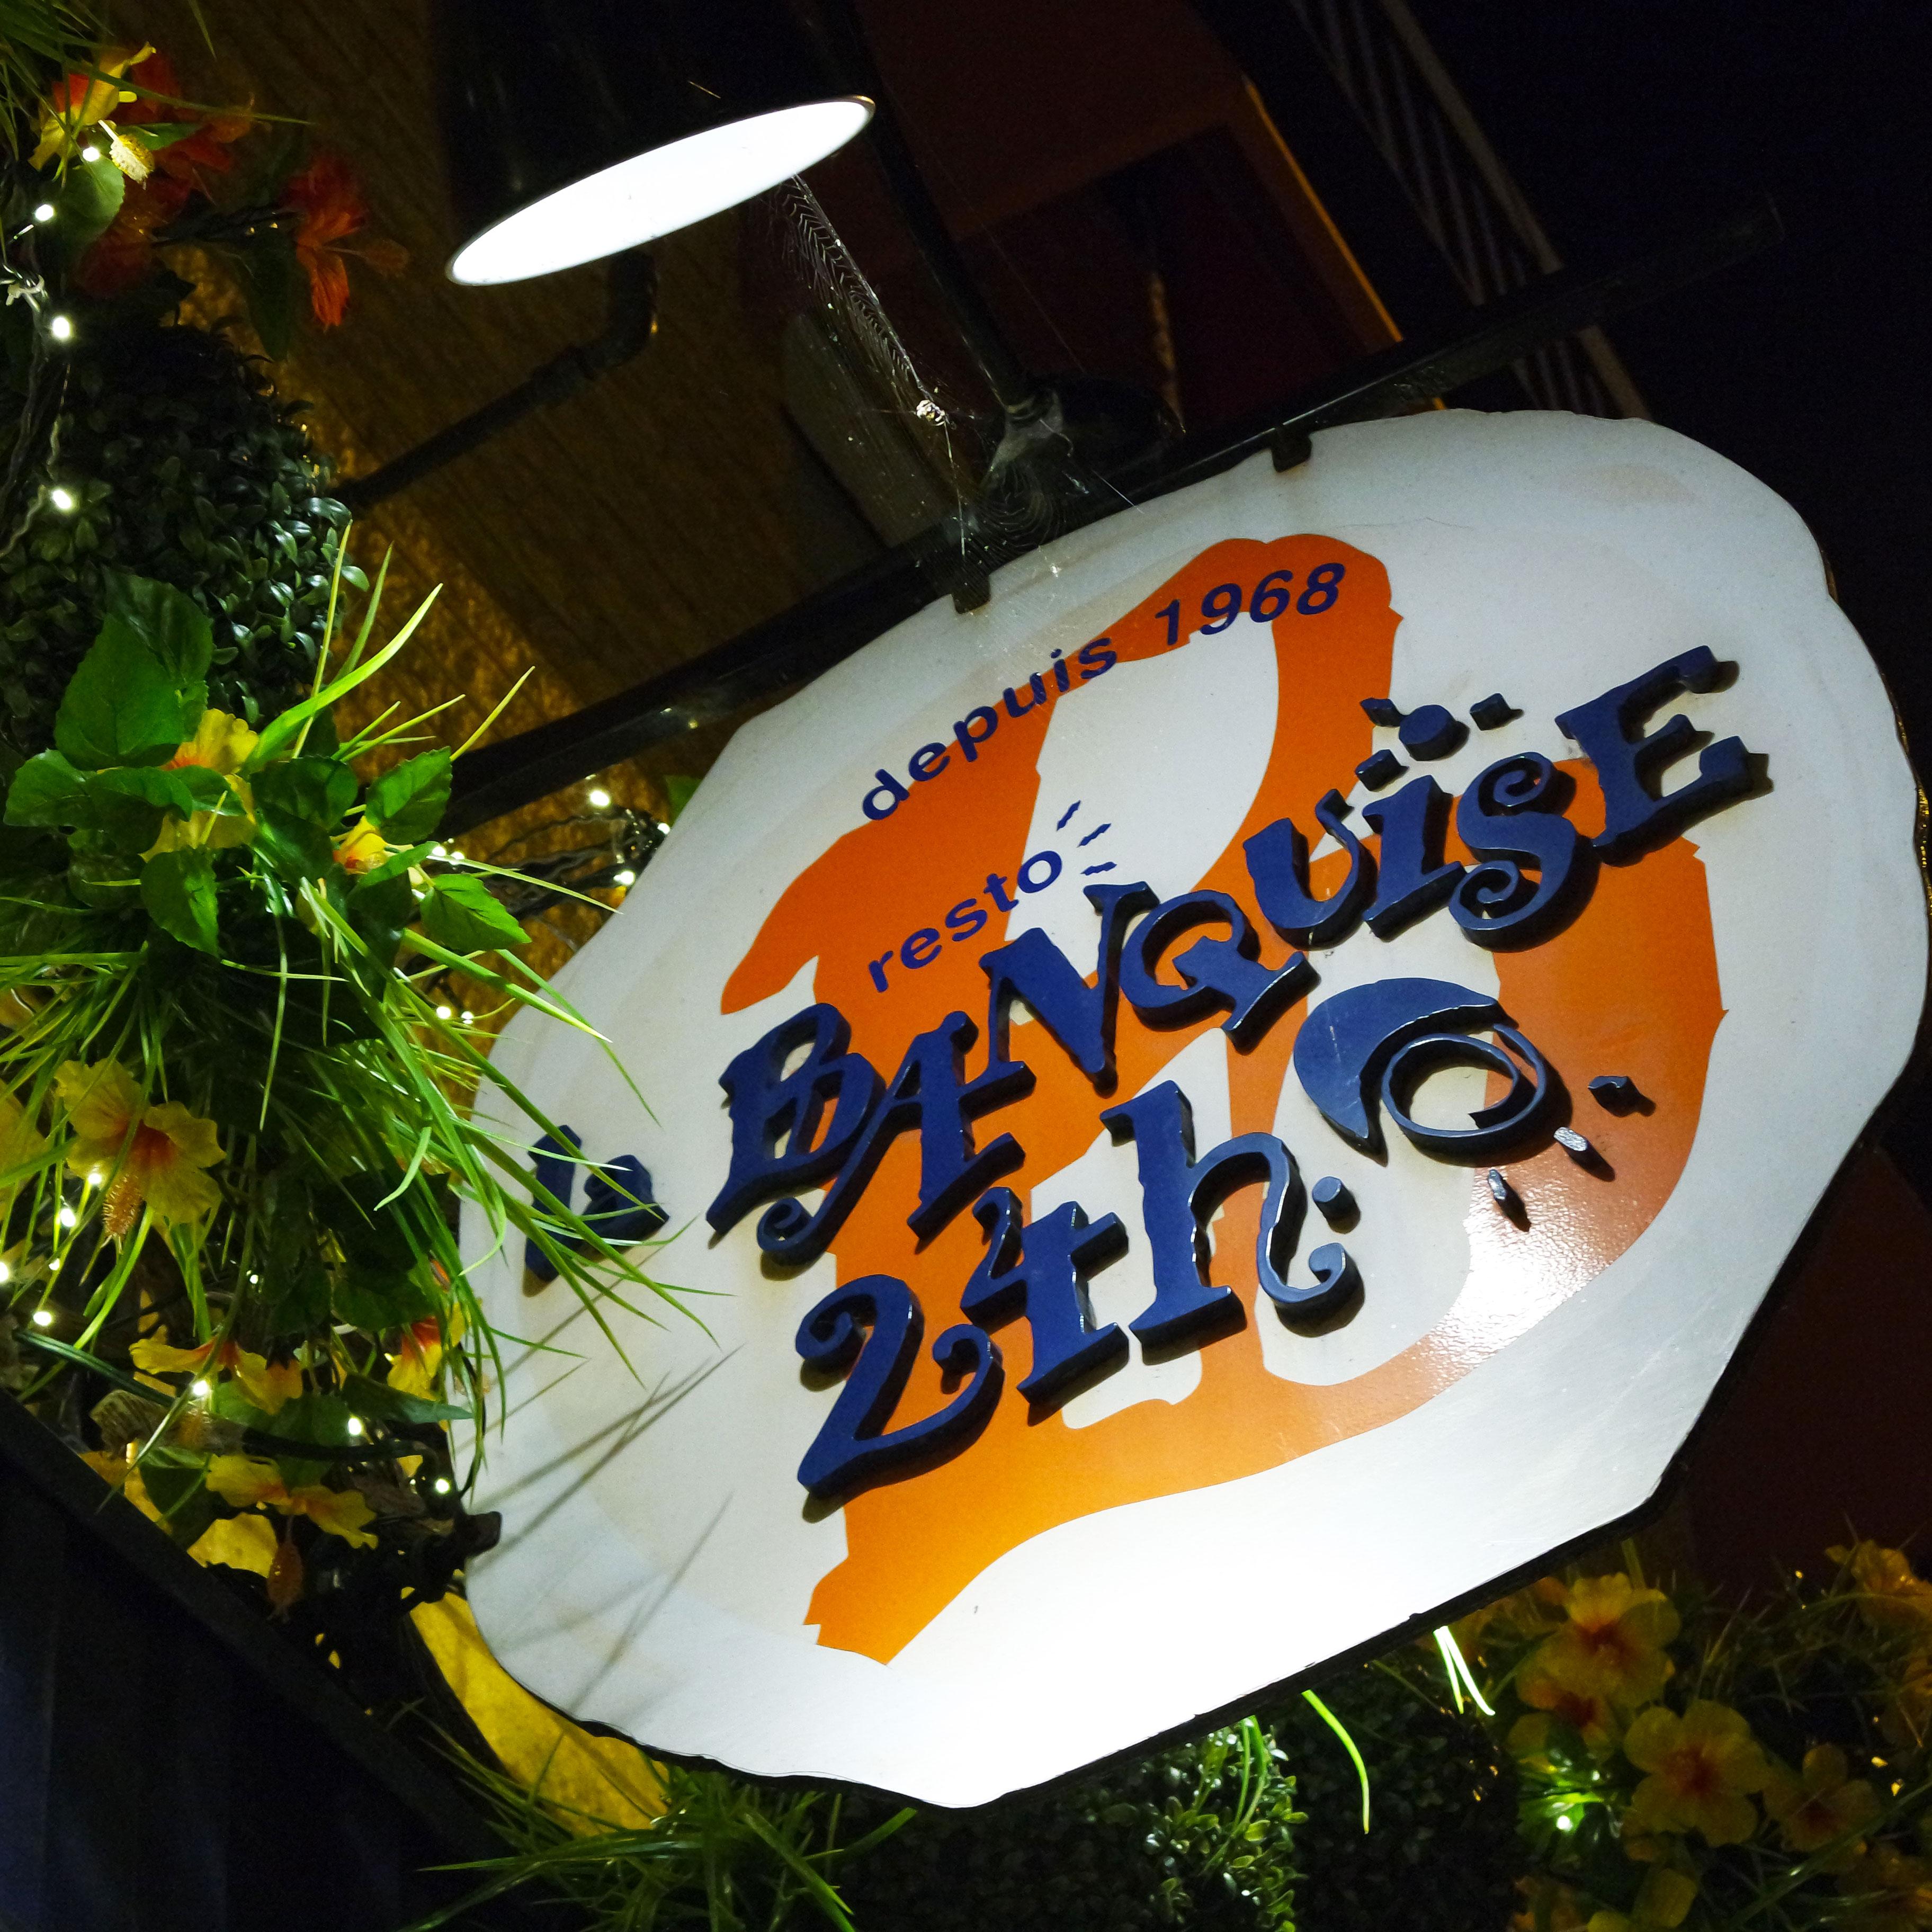 quoi-manger-montreal-city-trip-banquise-poutine